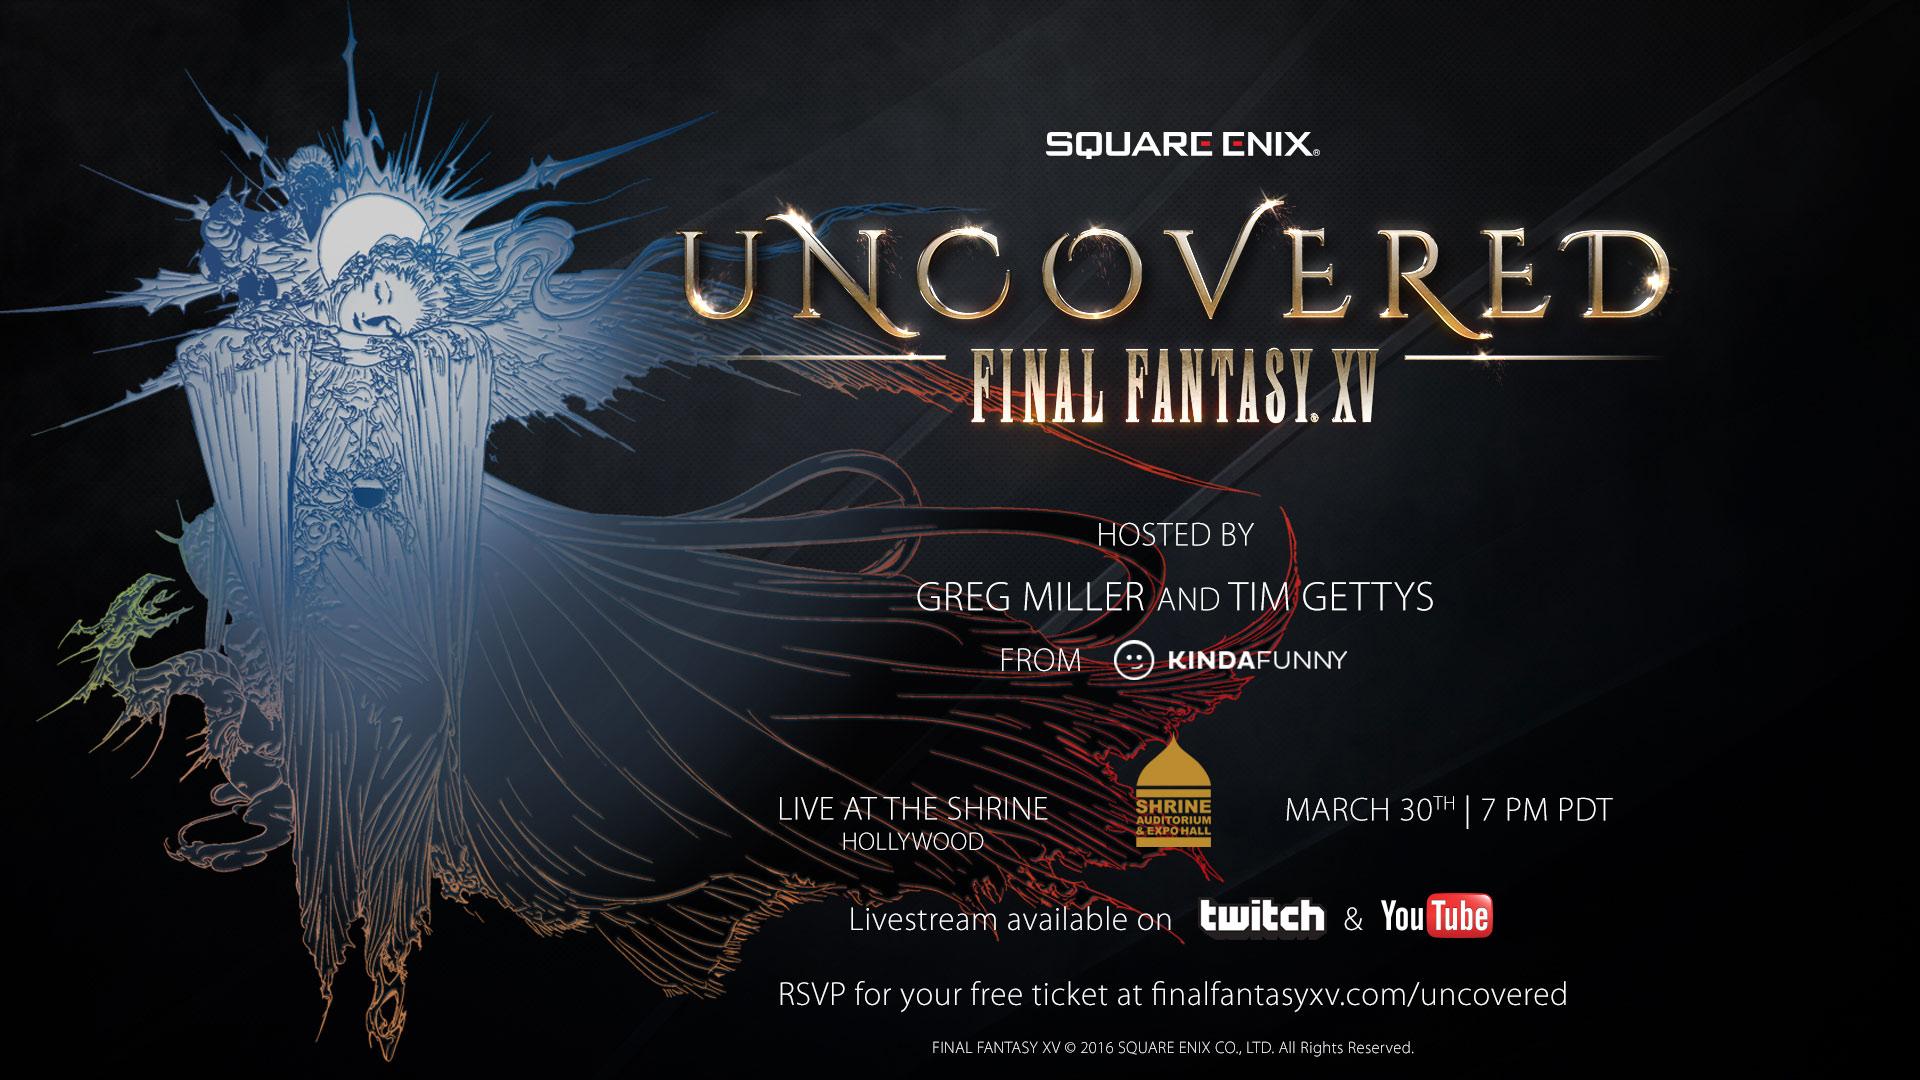 uncovered-final-fantasy-xv-visual